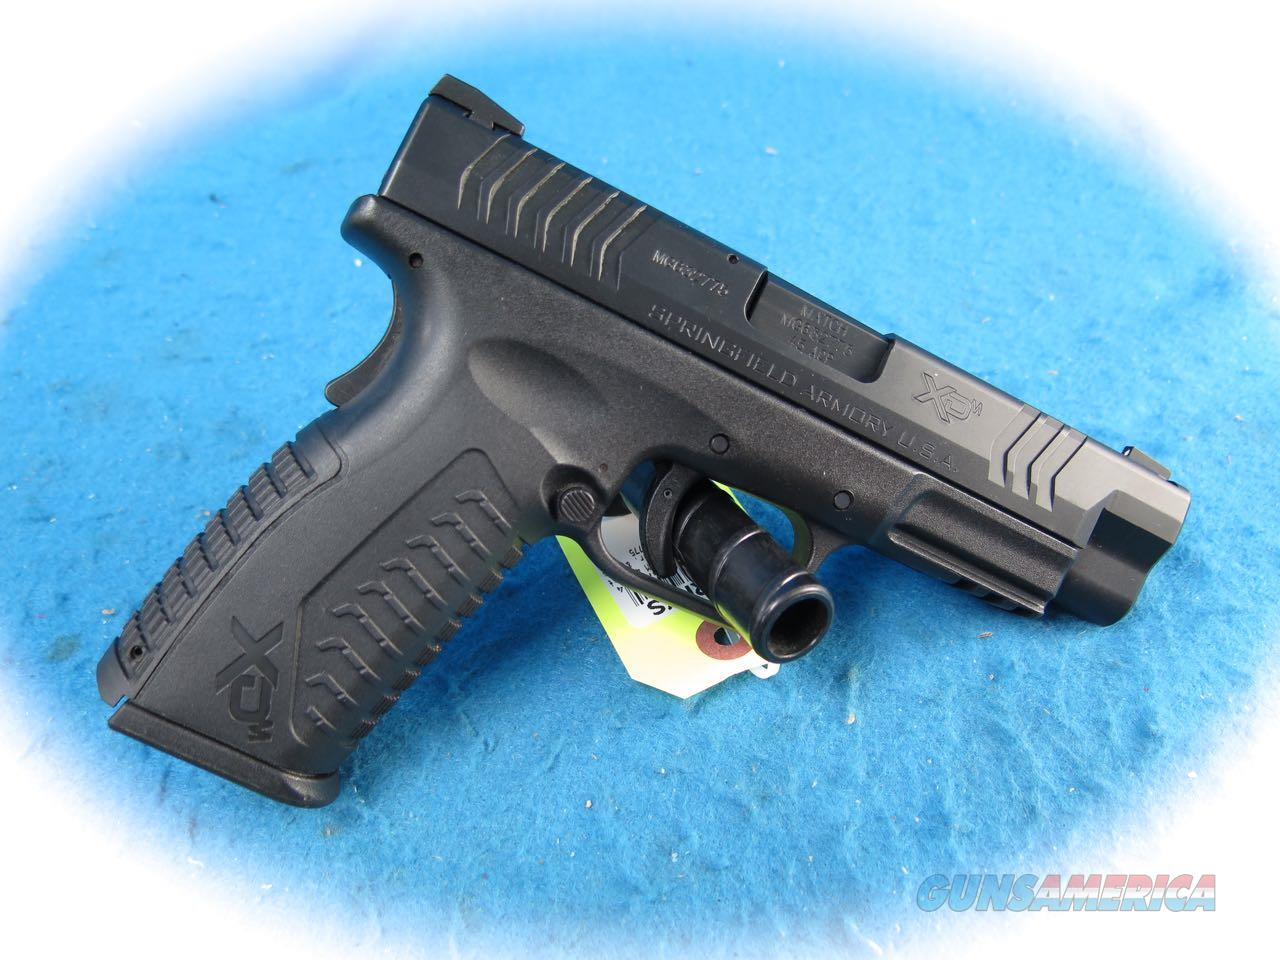 Springfield Armory XD-M 4.5 Pistol .45 ACP Cal W/Accessories **Used**  Guns > Pistols > Springfield Armory Pistols > XD-M